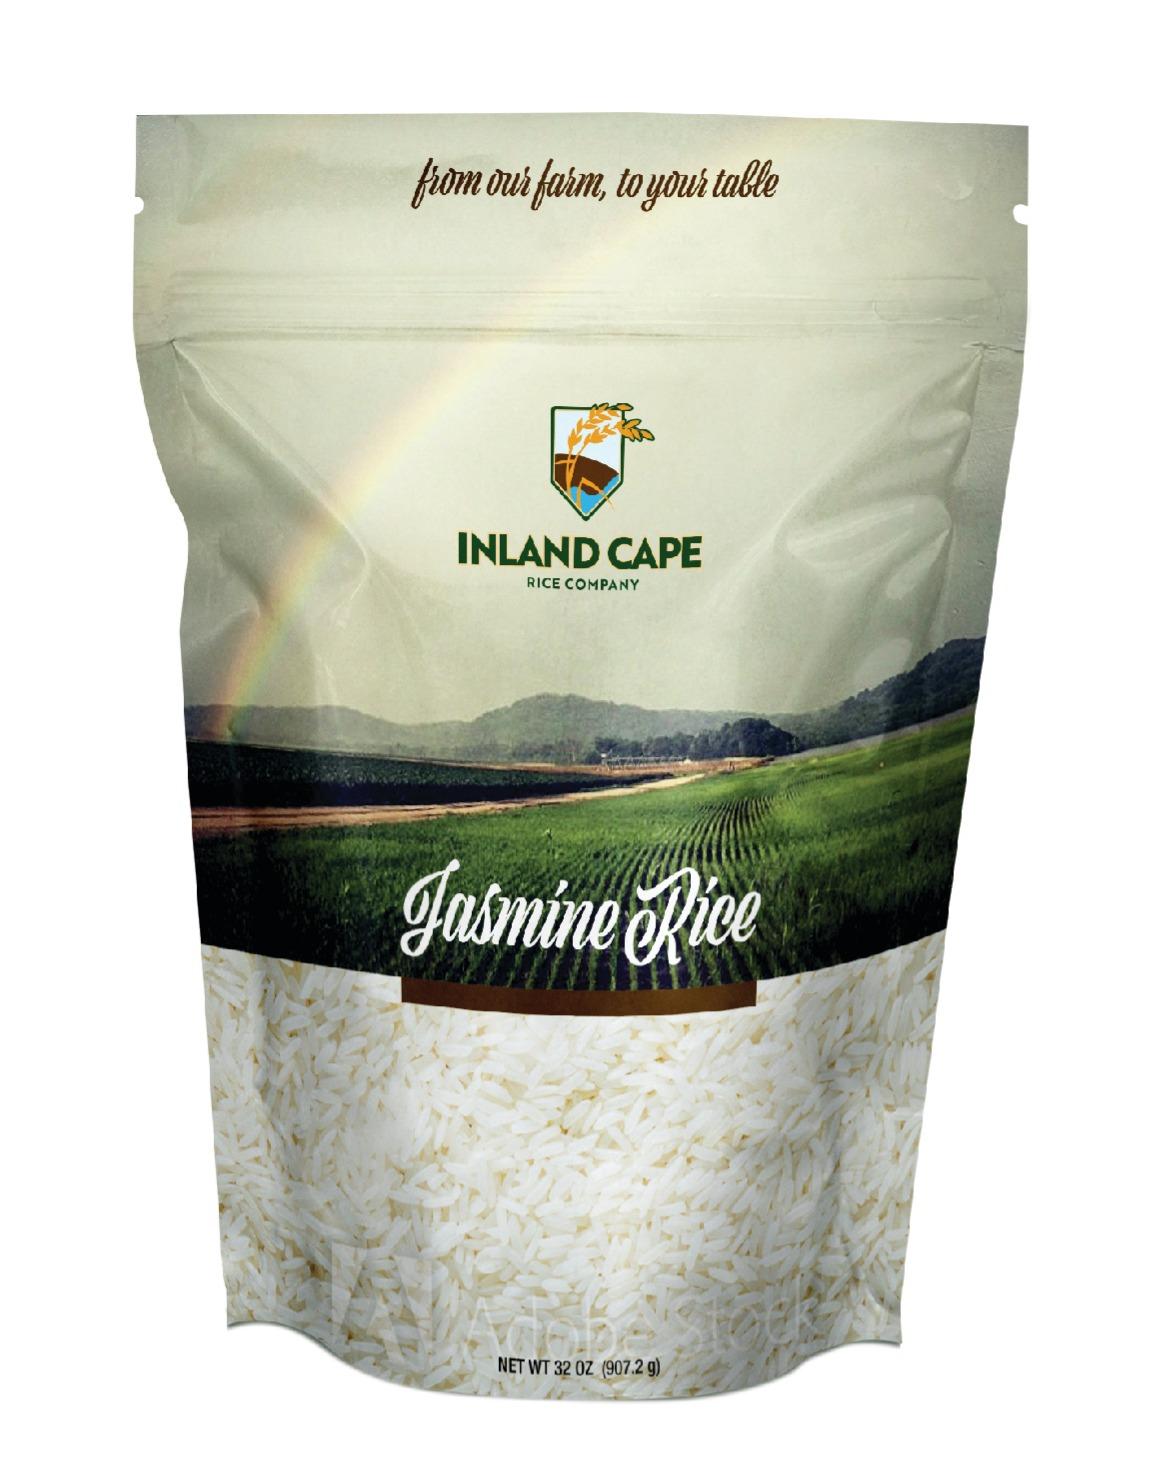 Inland Cape Rice Company